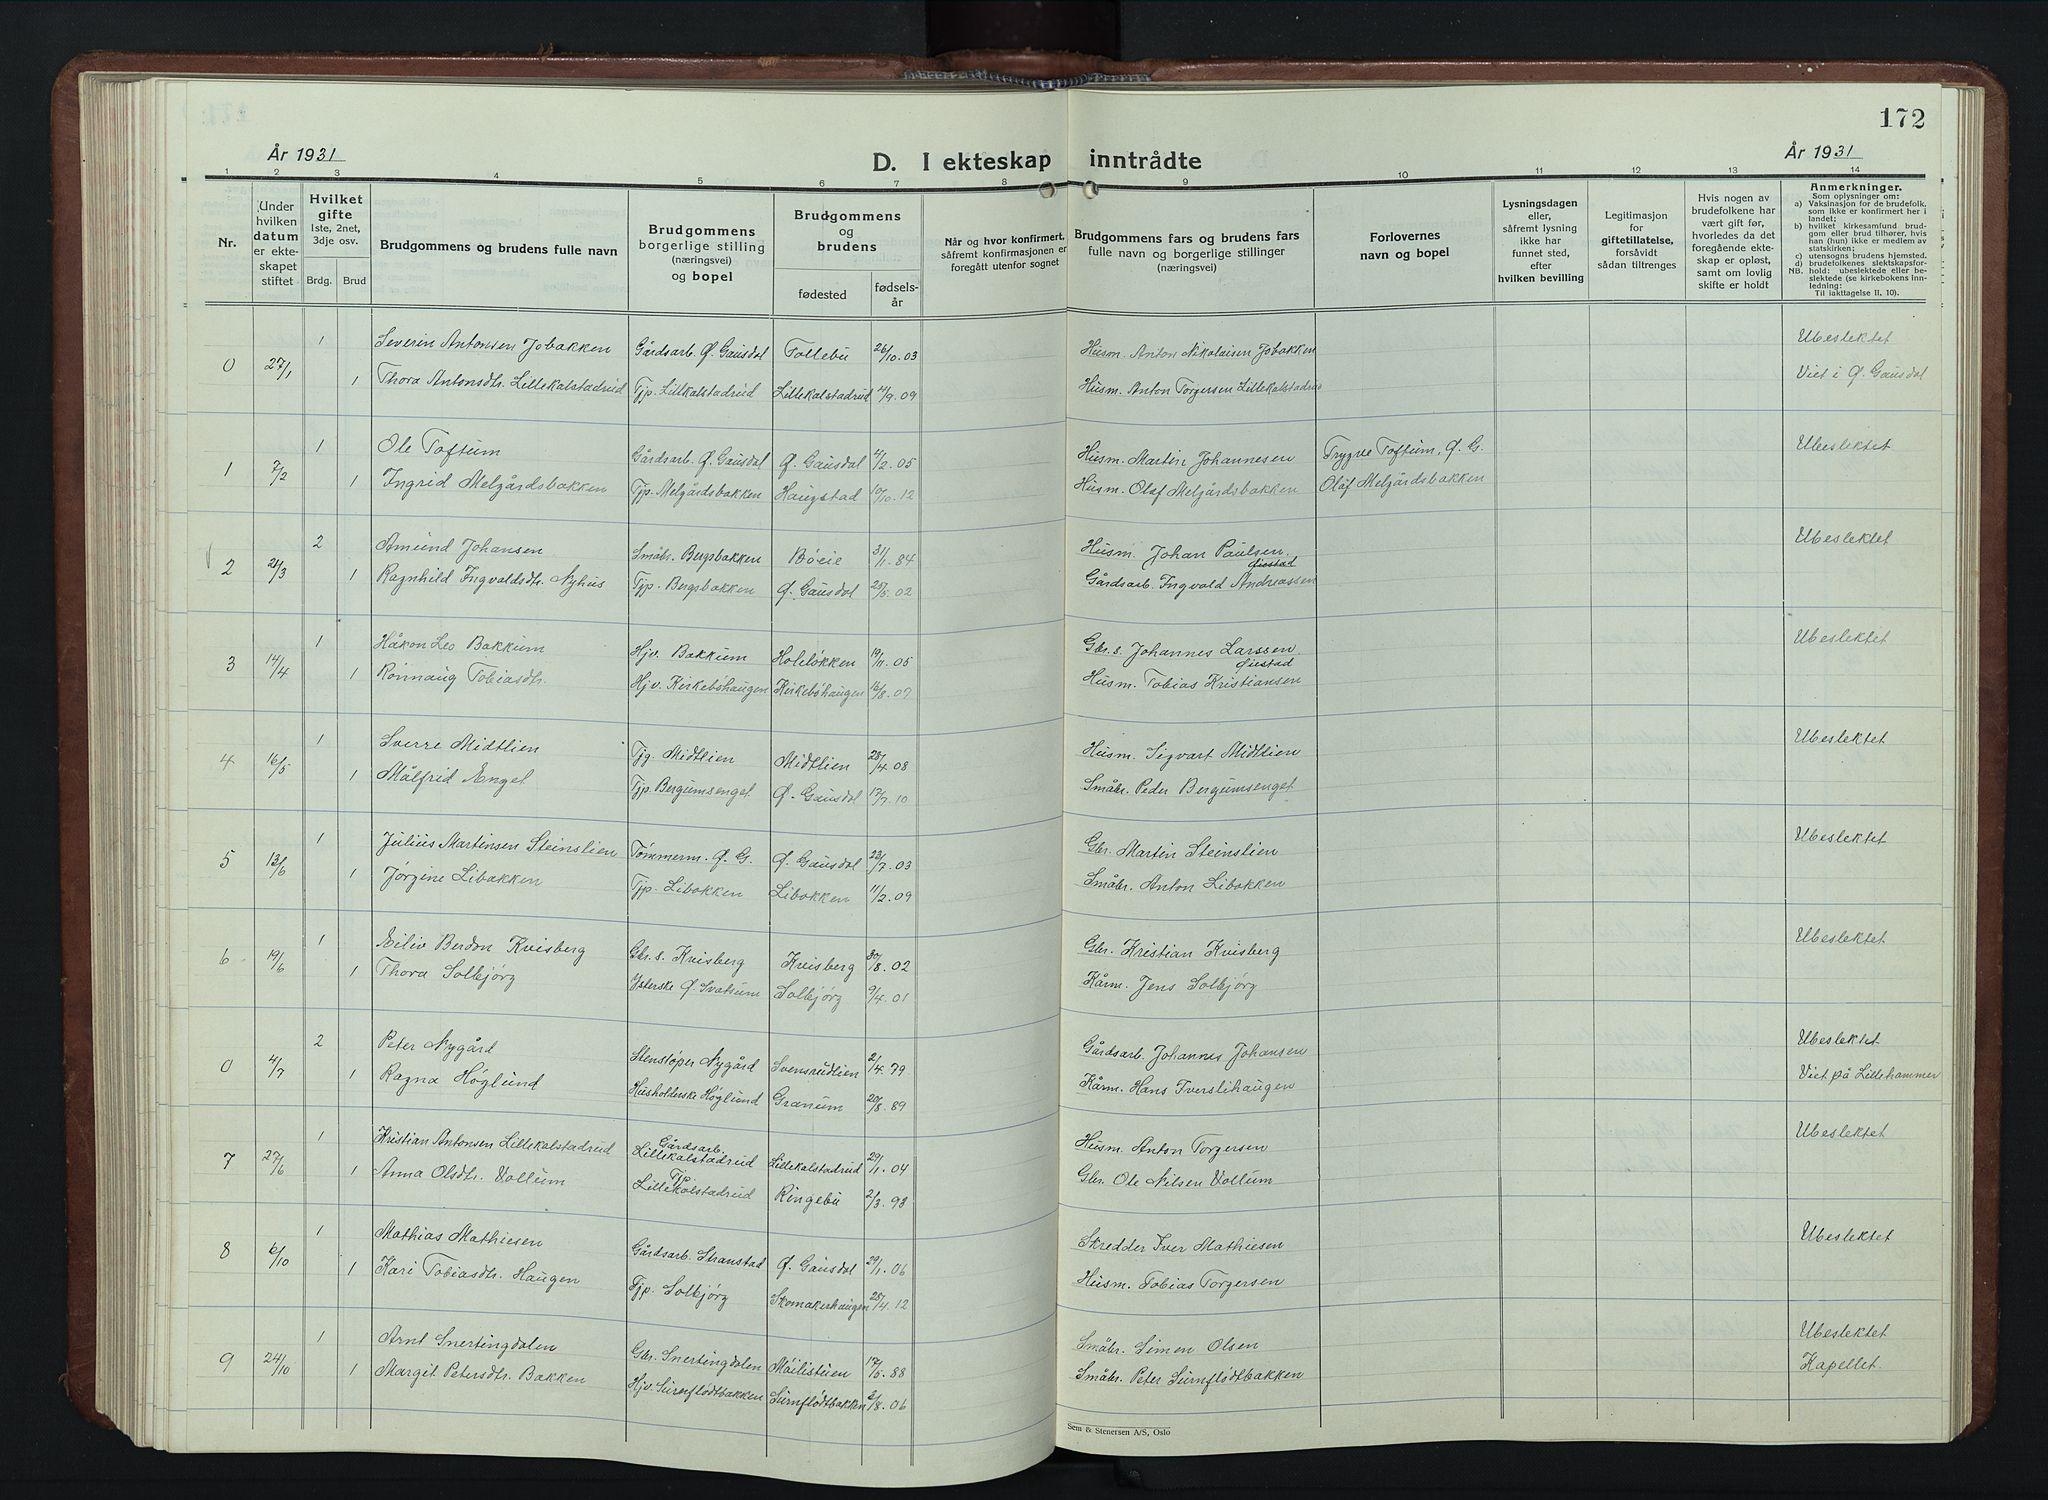 SAH, Vestre Gausdal prestekontor, Klokkerbok nr. 5, 1926-1955, s. 172